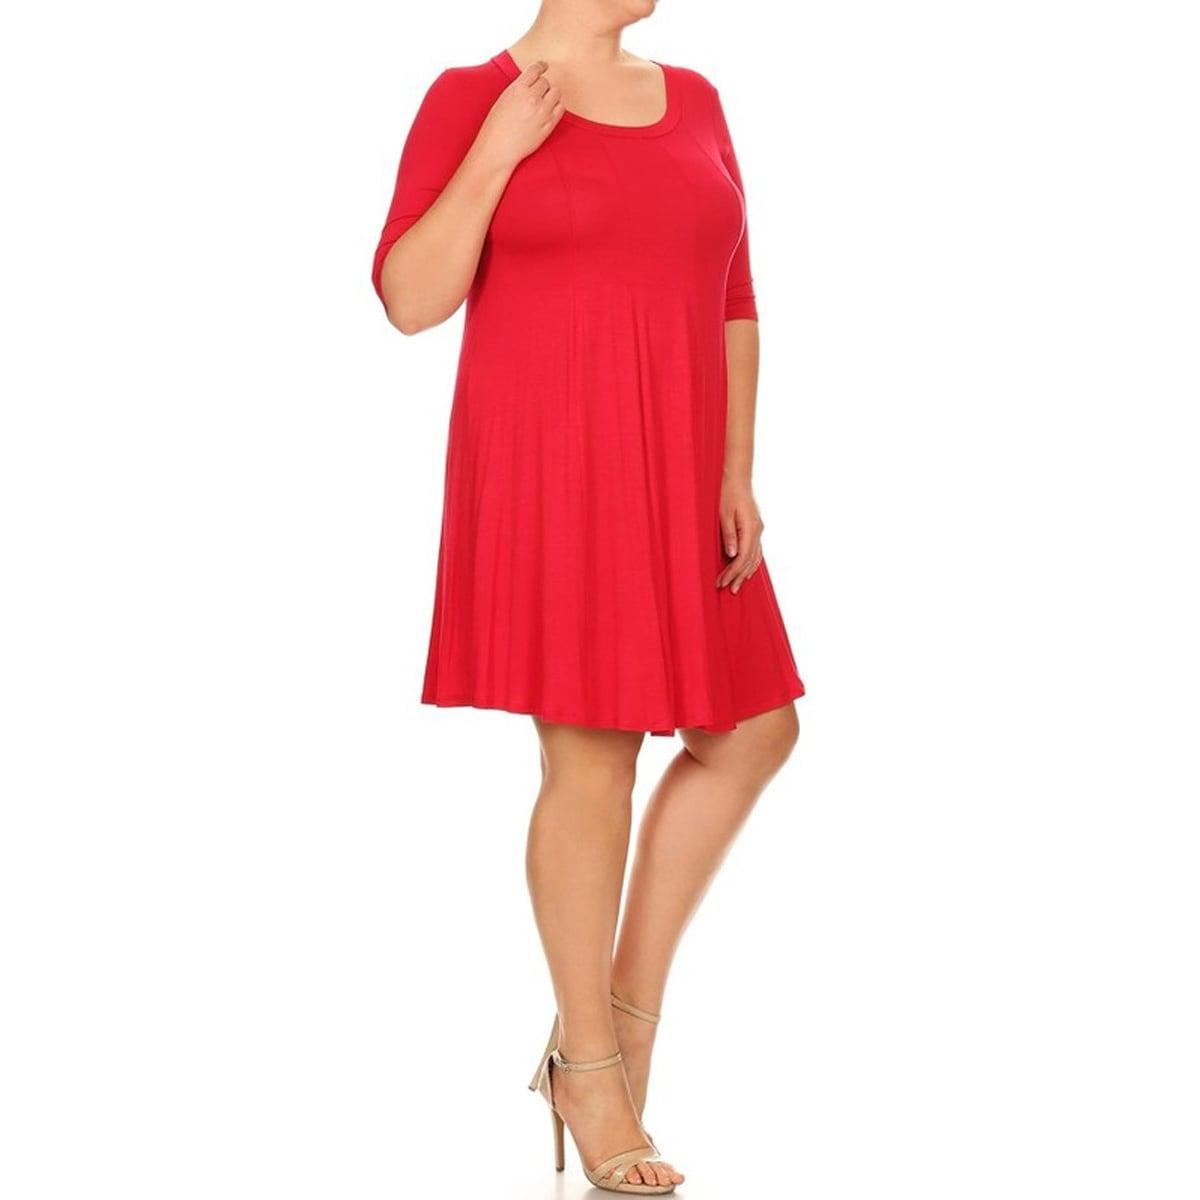 Women-039-s-Solid-Jersey-Plus-Size-Knit-Dress thumbnail 7